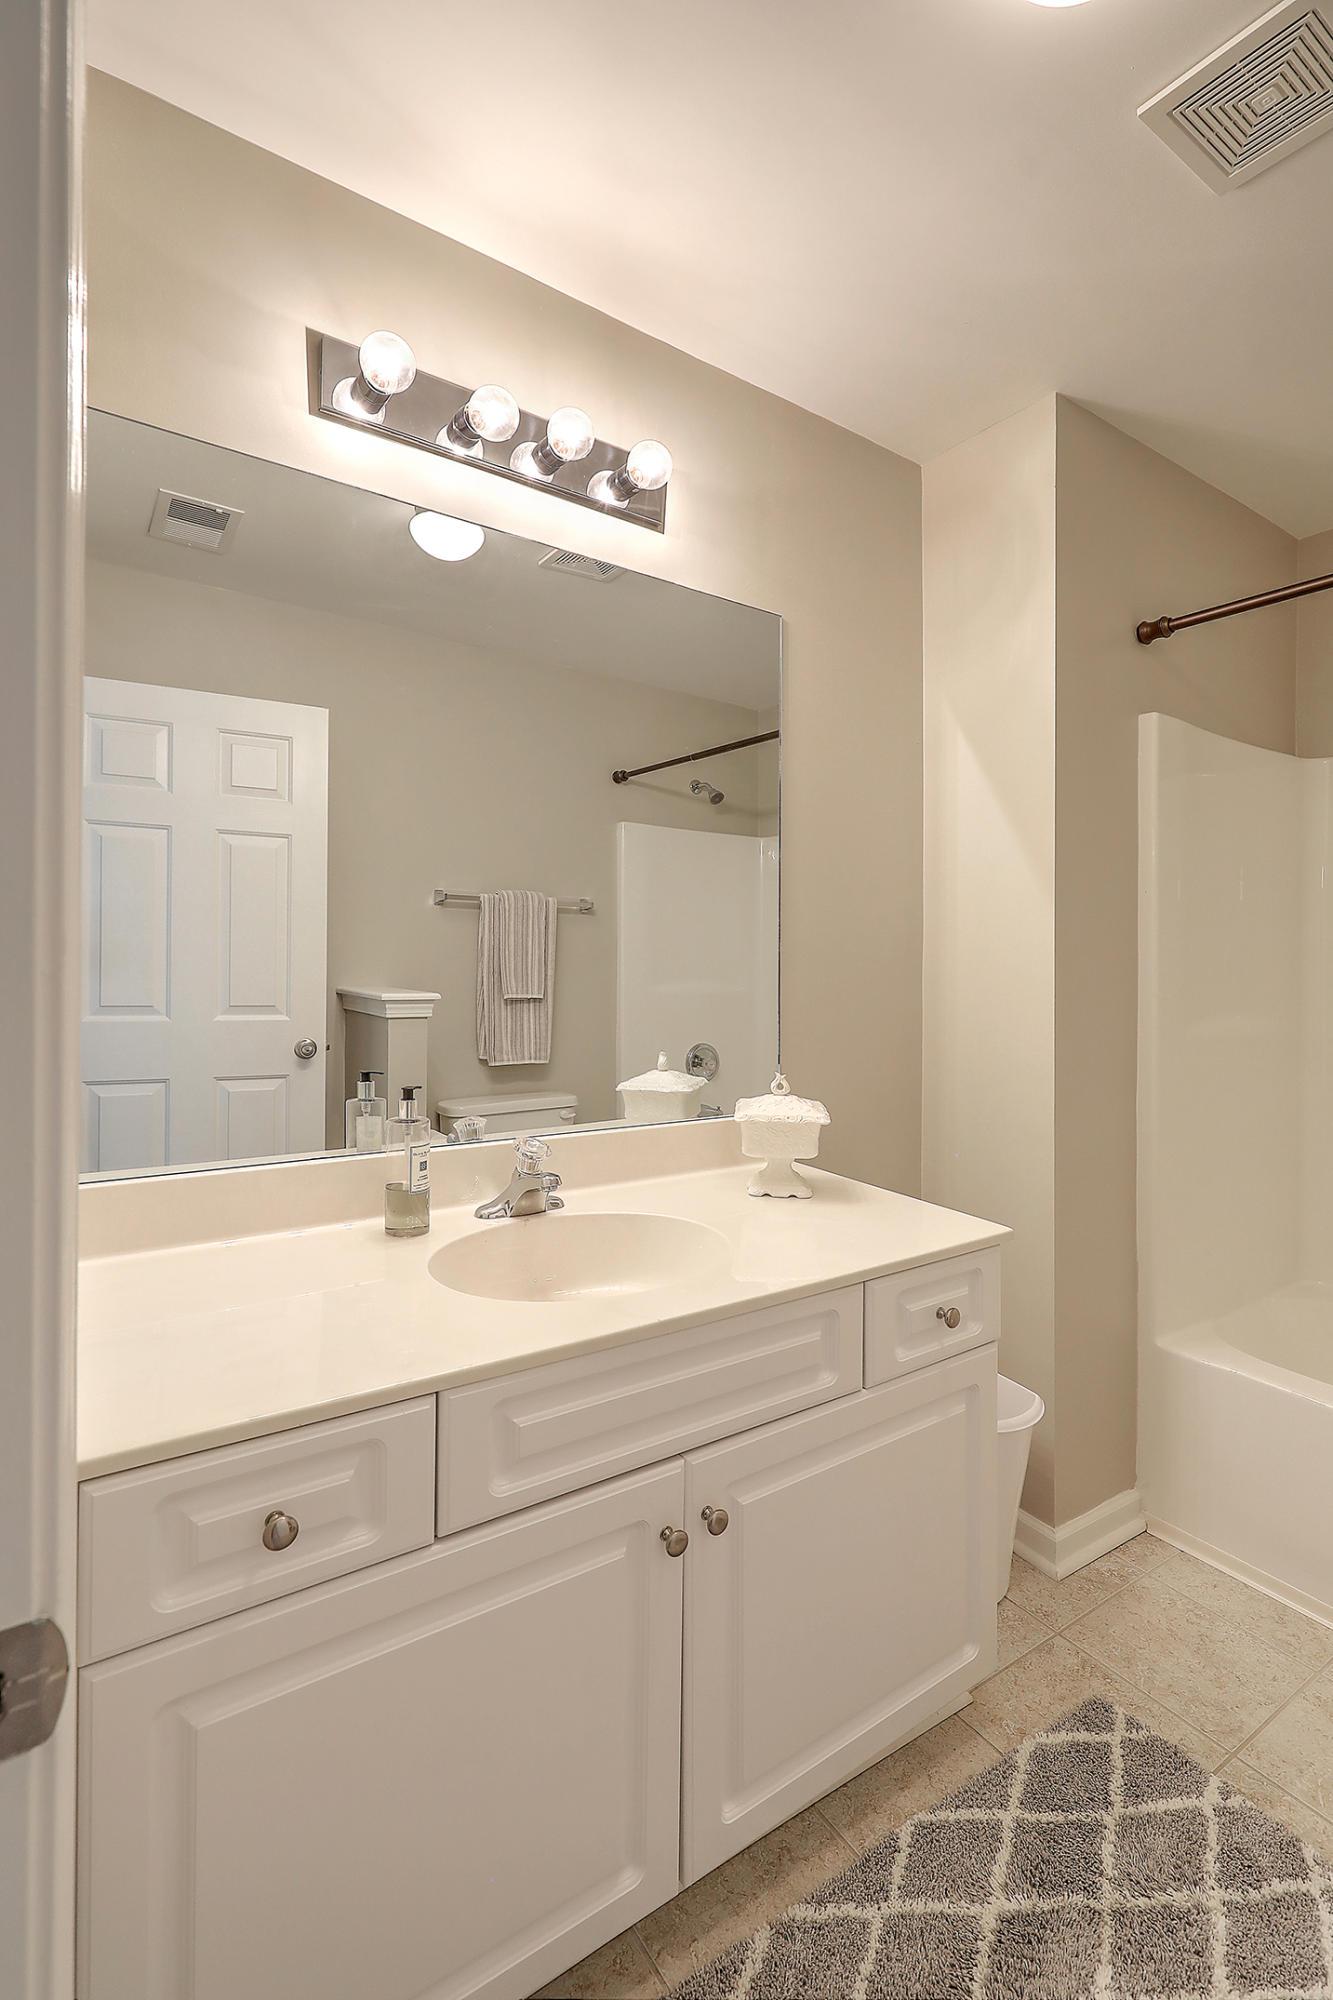 Ashley Park Homes For Sale - 4149 Perrine, Charleston, SC - 11